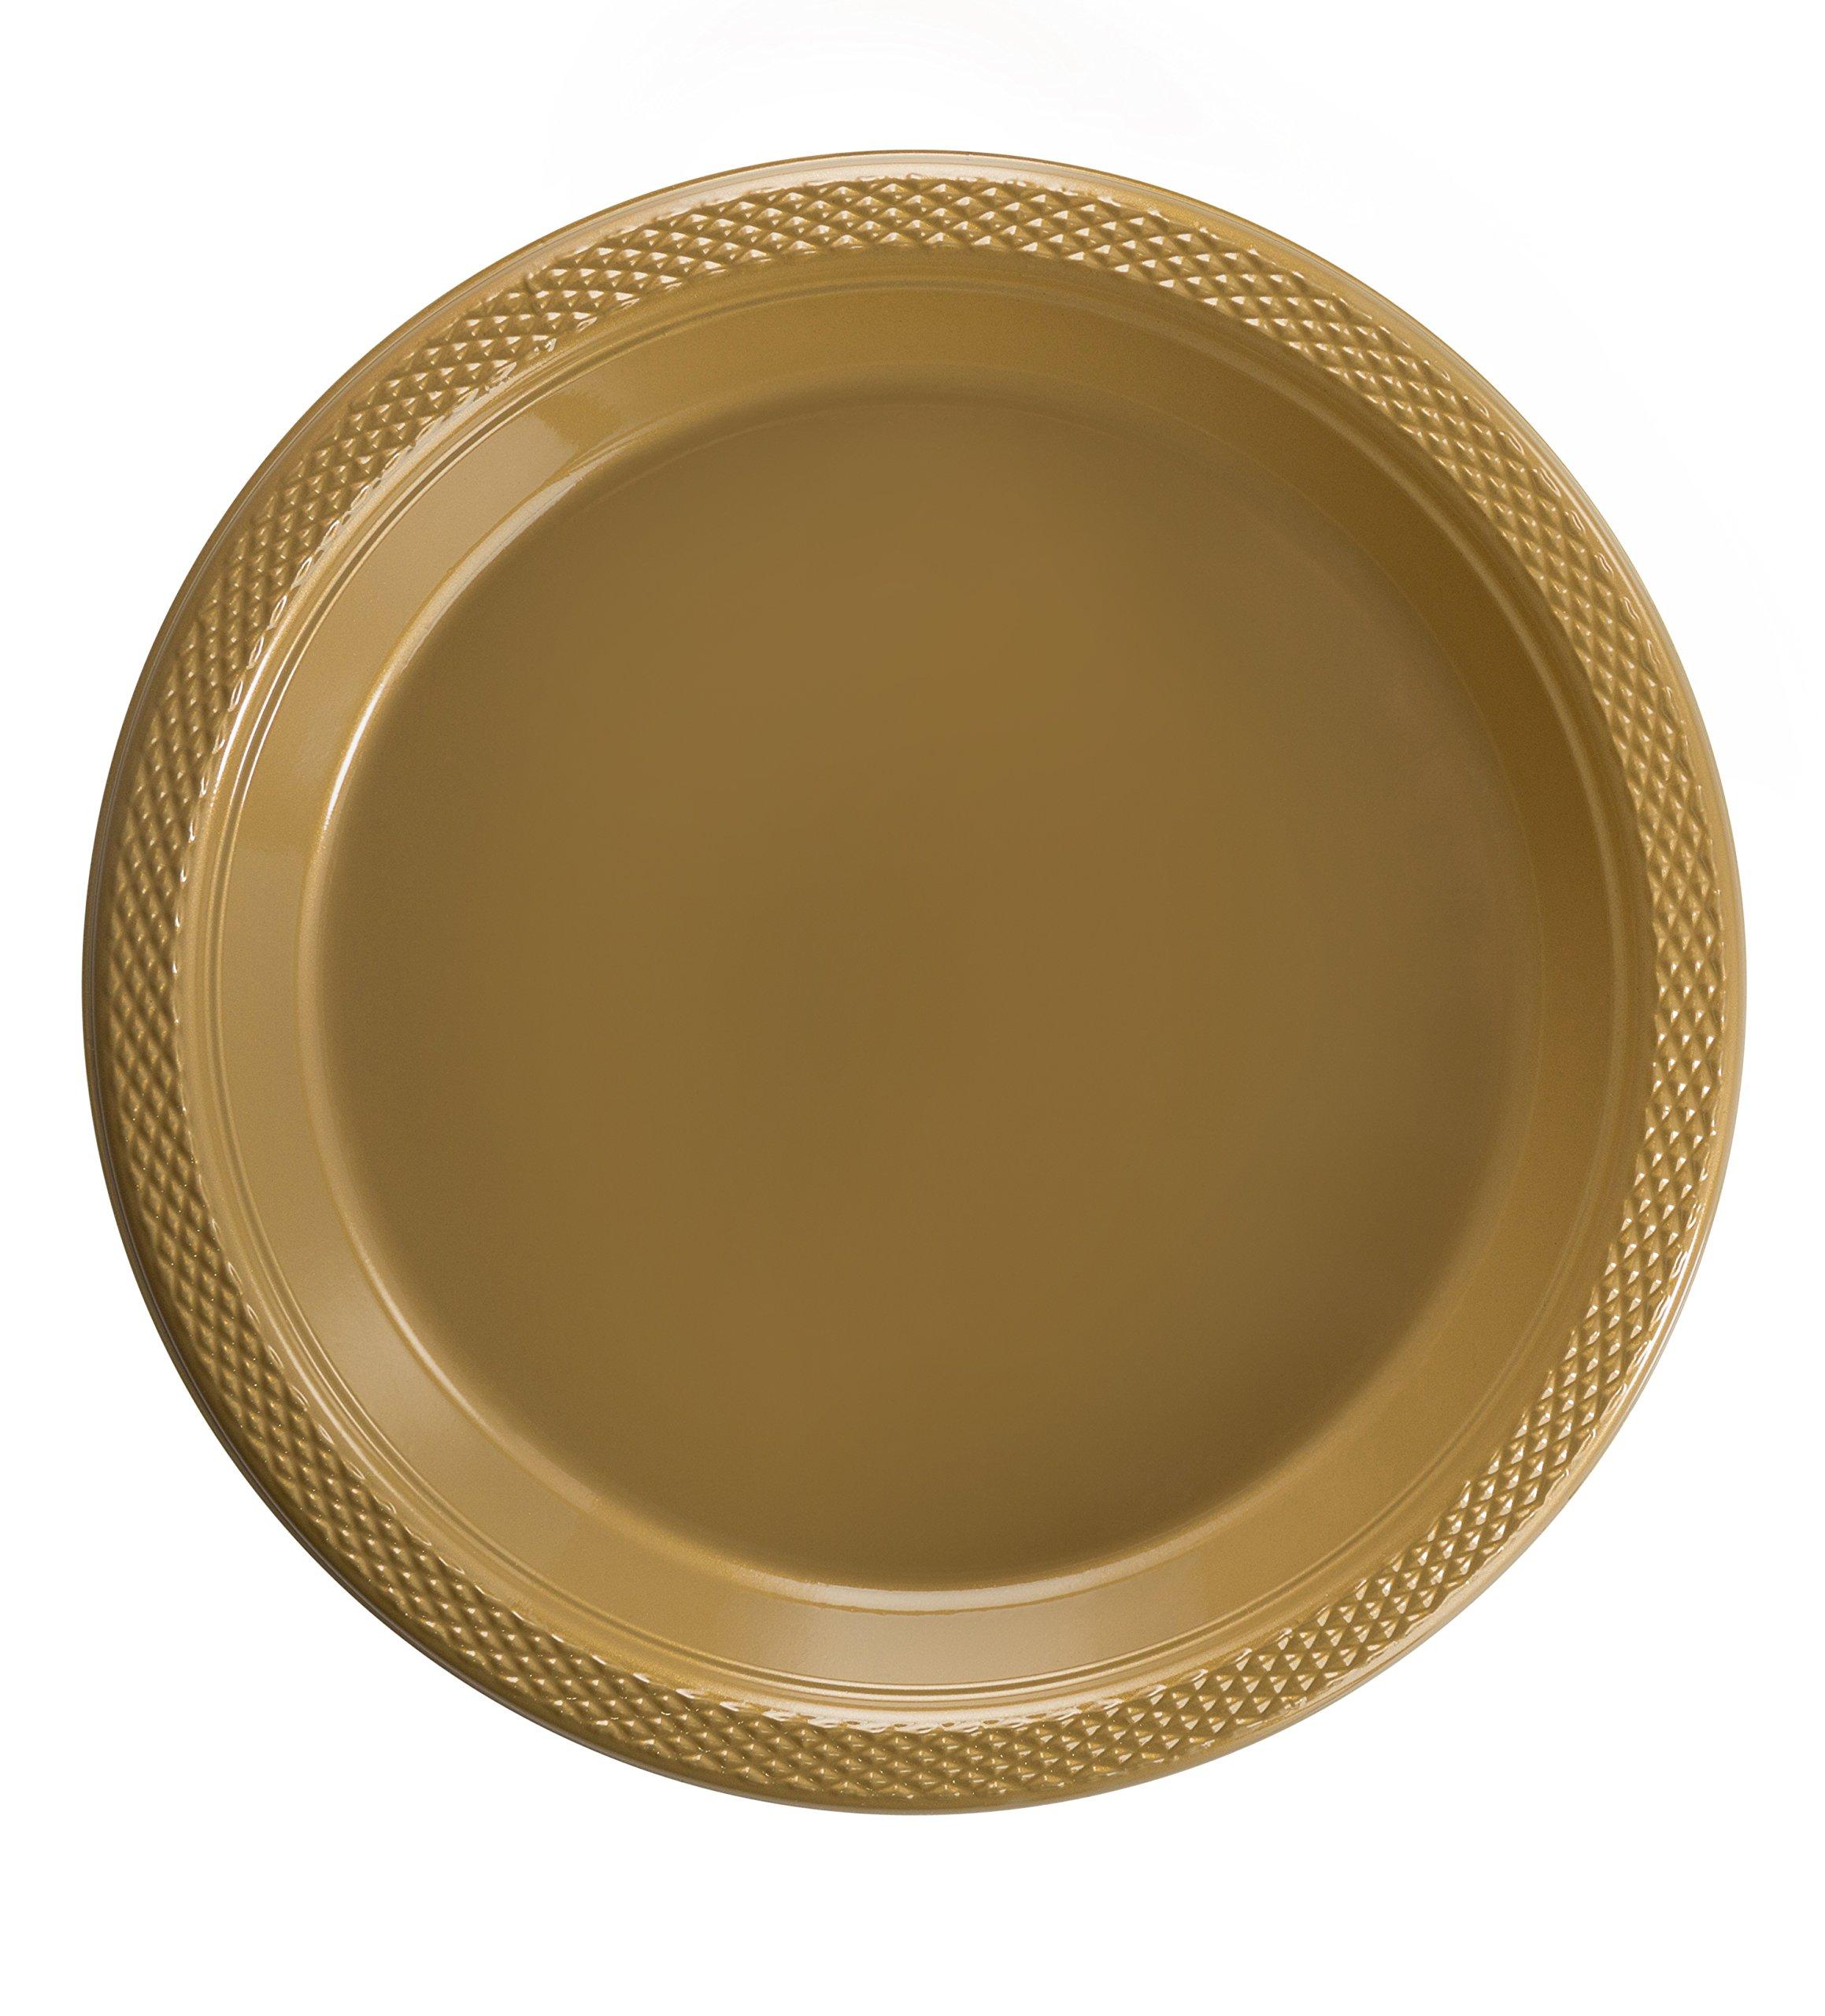 Exquisite Plastic Dessert/Salad Plates - Solid Color Disposable Plates - 100 Count (10 Inch, Gold)